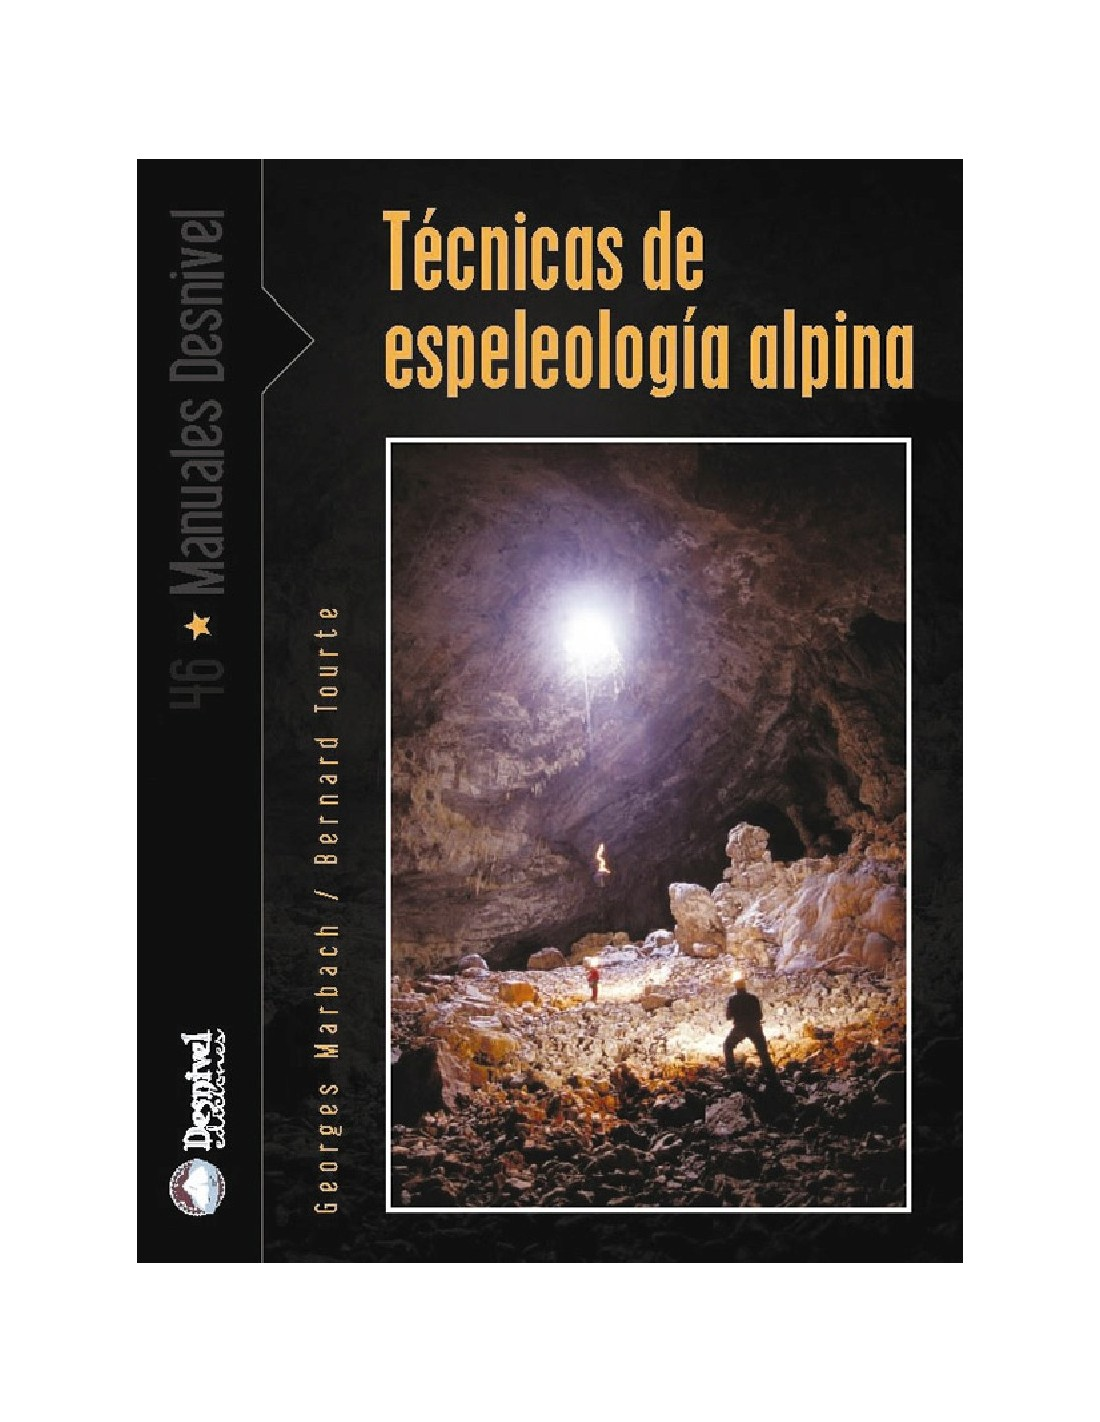 Libro t cnicas de espeleolog a alpina machay for Tecnicas basicas de cocina libro